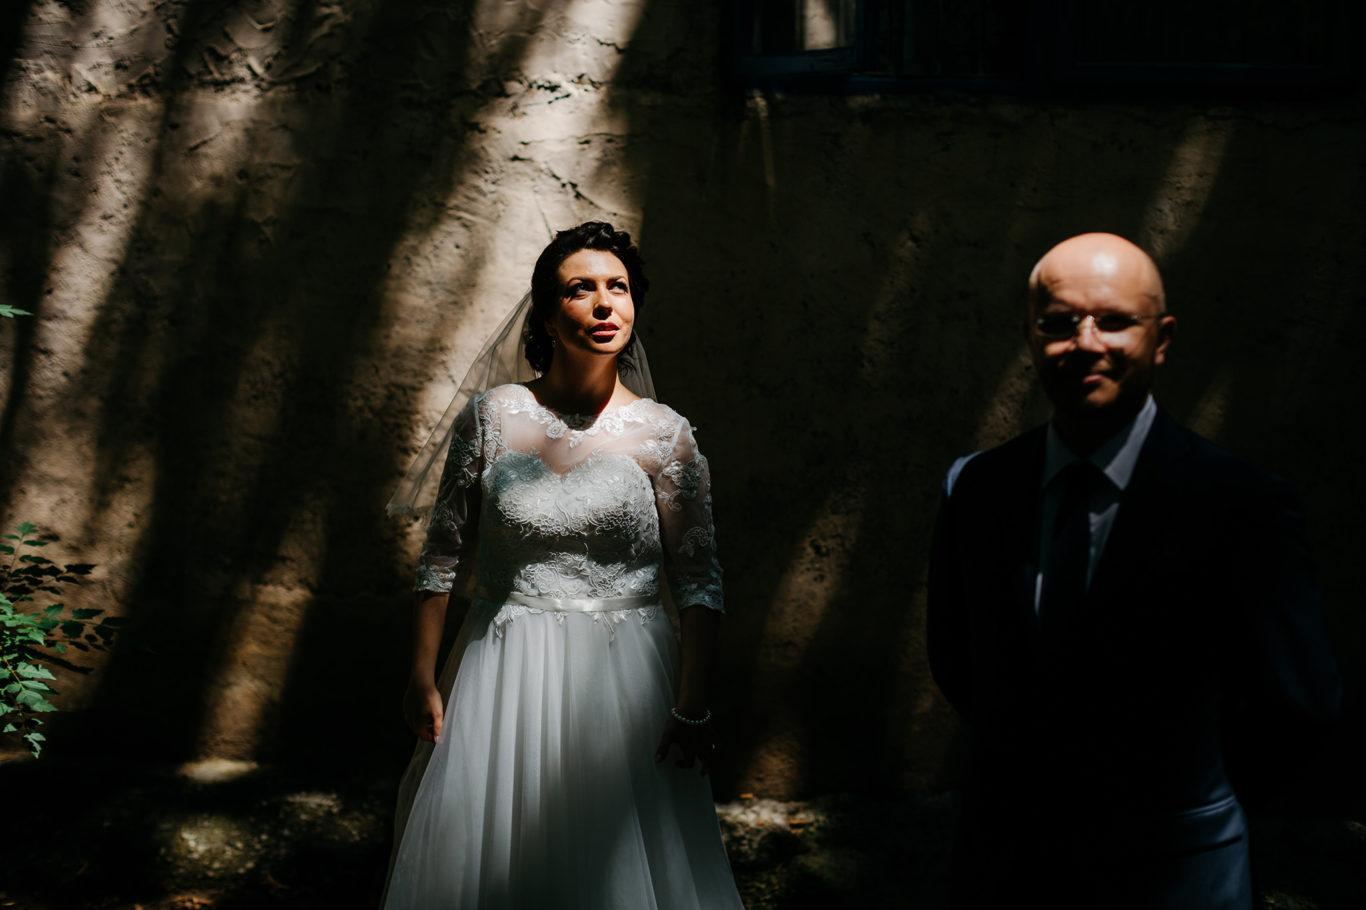 0288-fotografie-nunta-bucuresti-anca-george-fotograf-ciprian-dumitrescu-dcf_4535